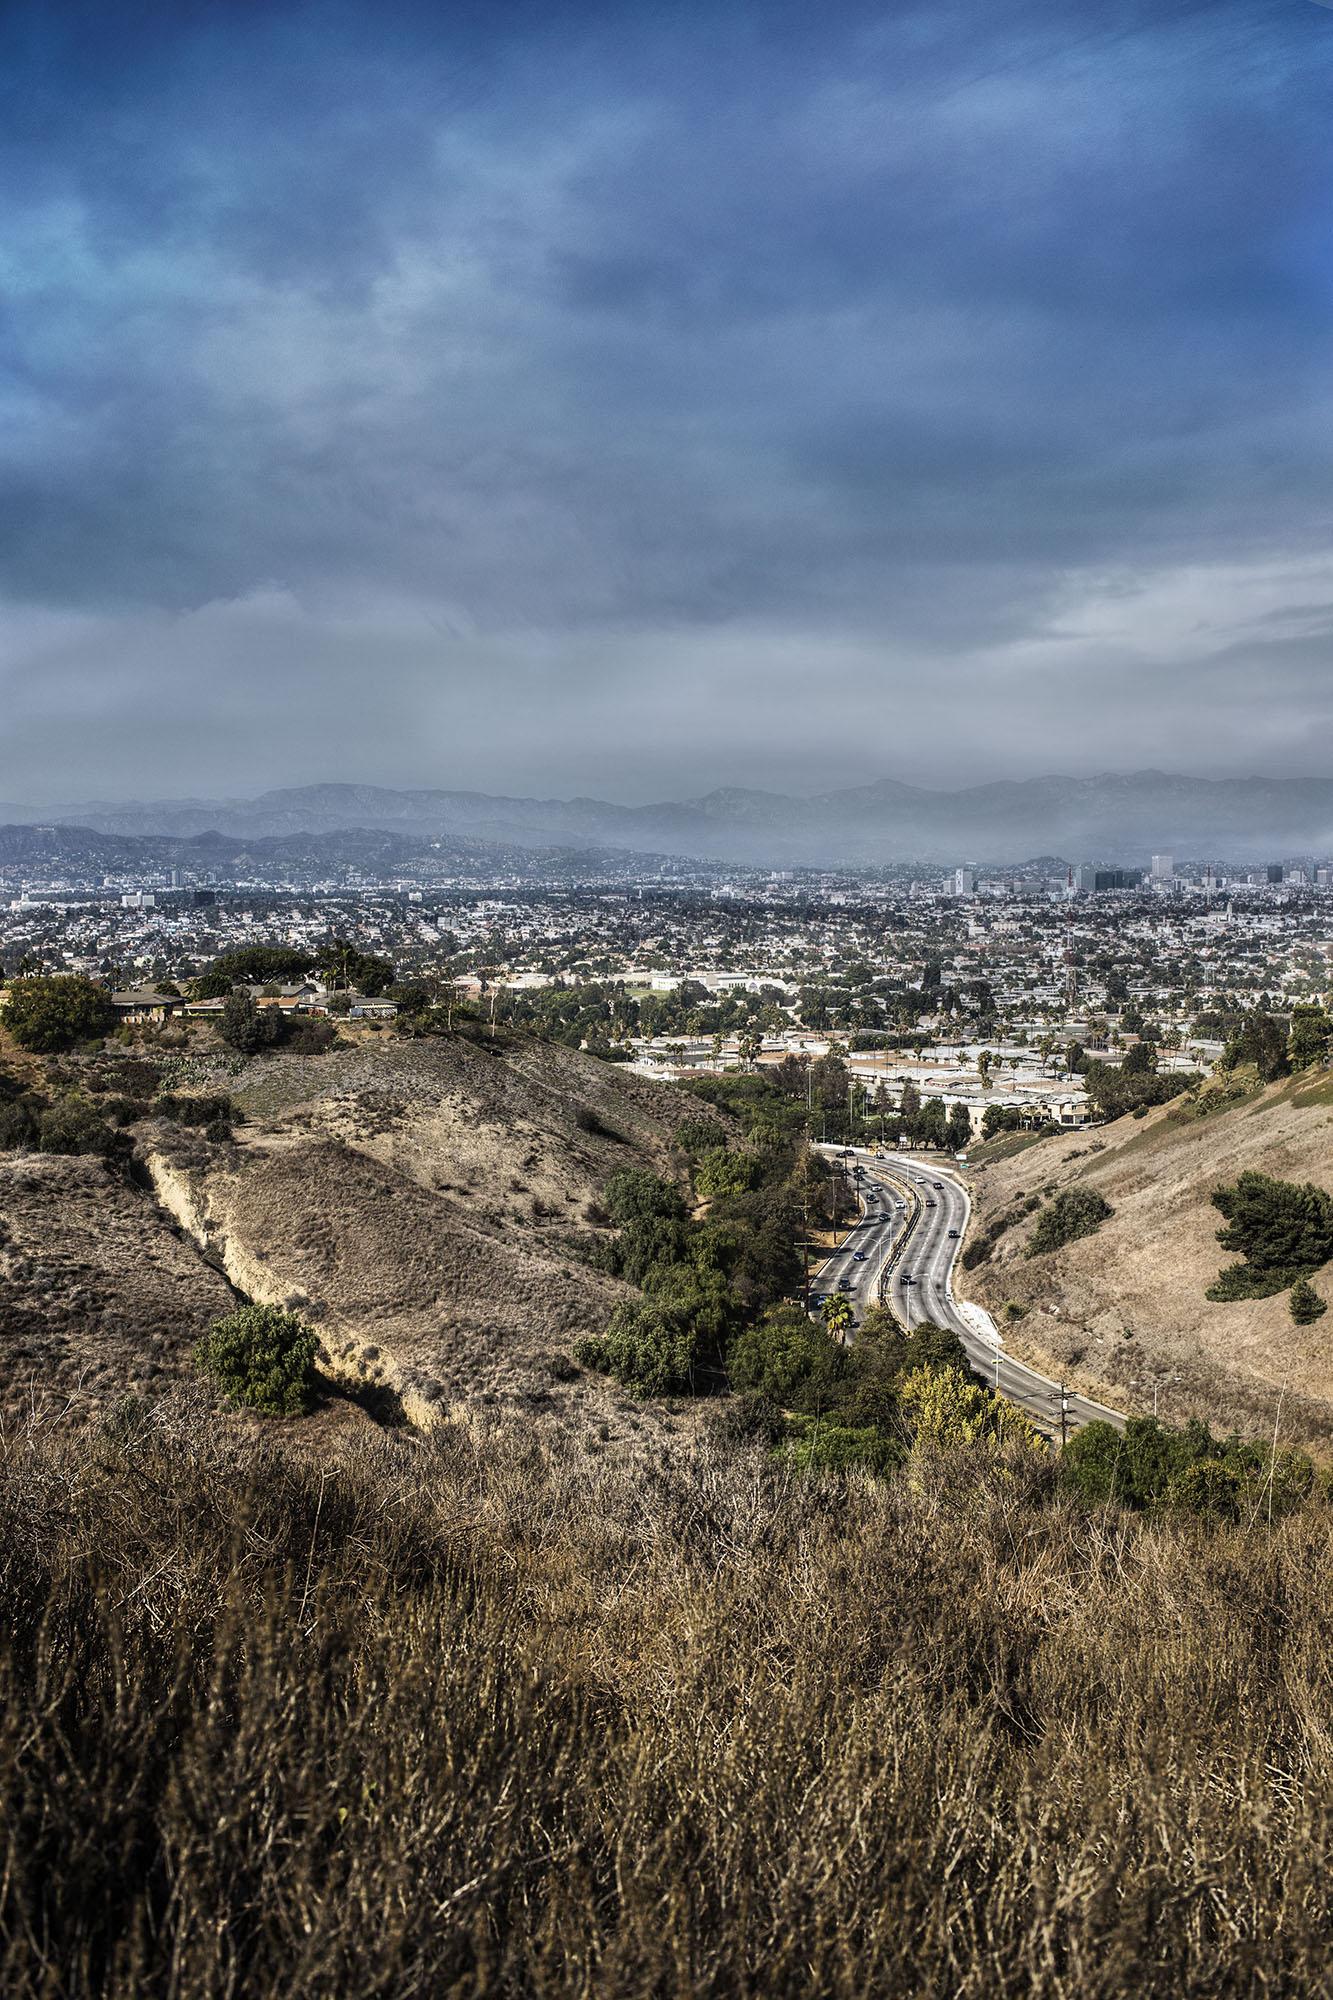 Hollywood Observ by Rich J. Velasco